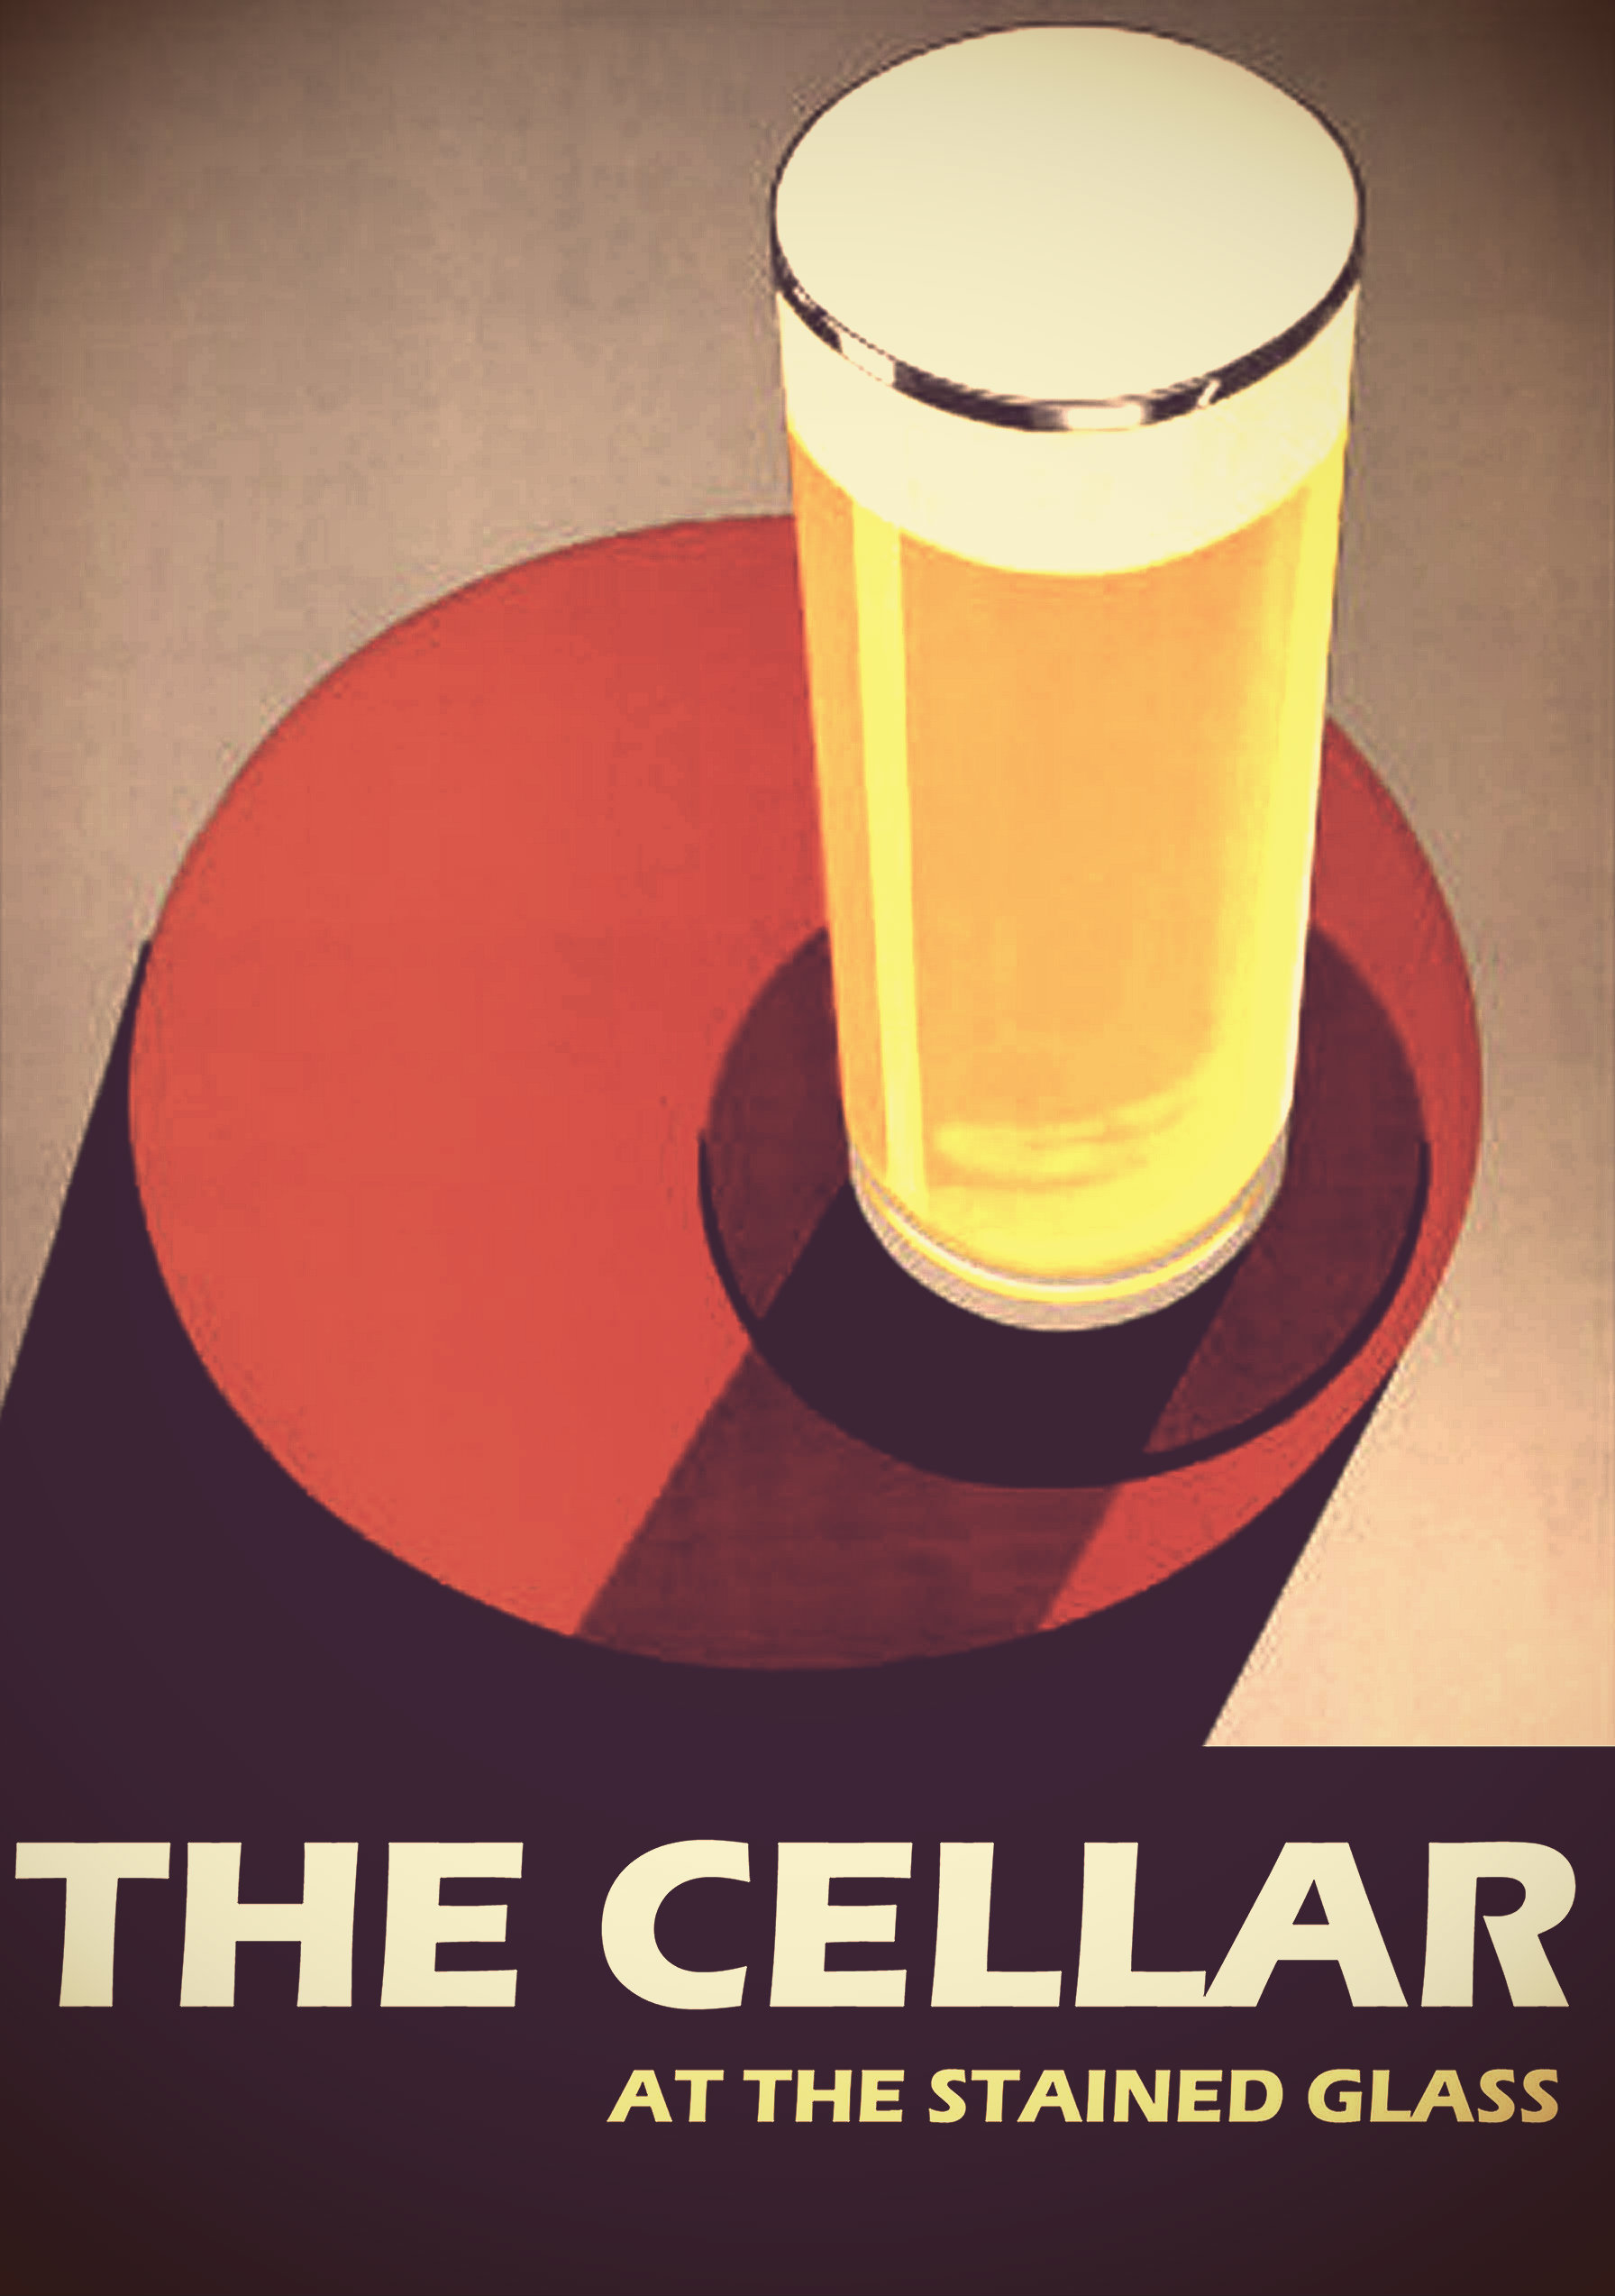 cellar logo 1.jpg